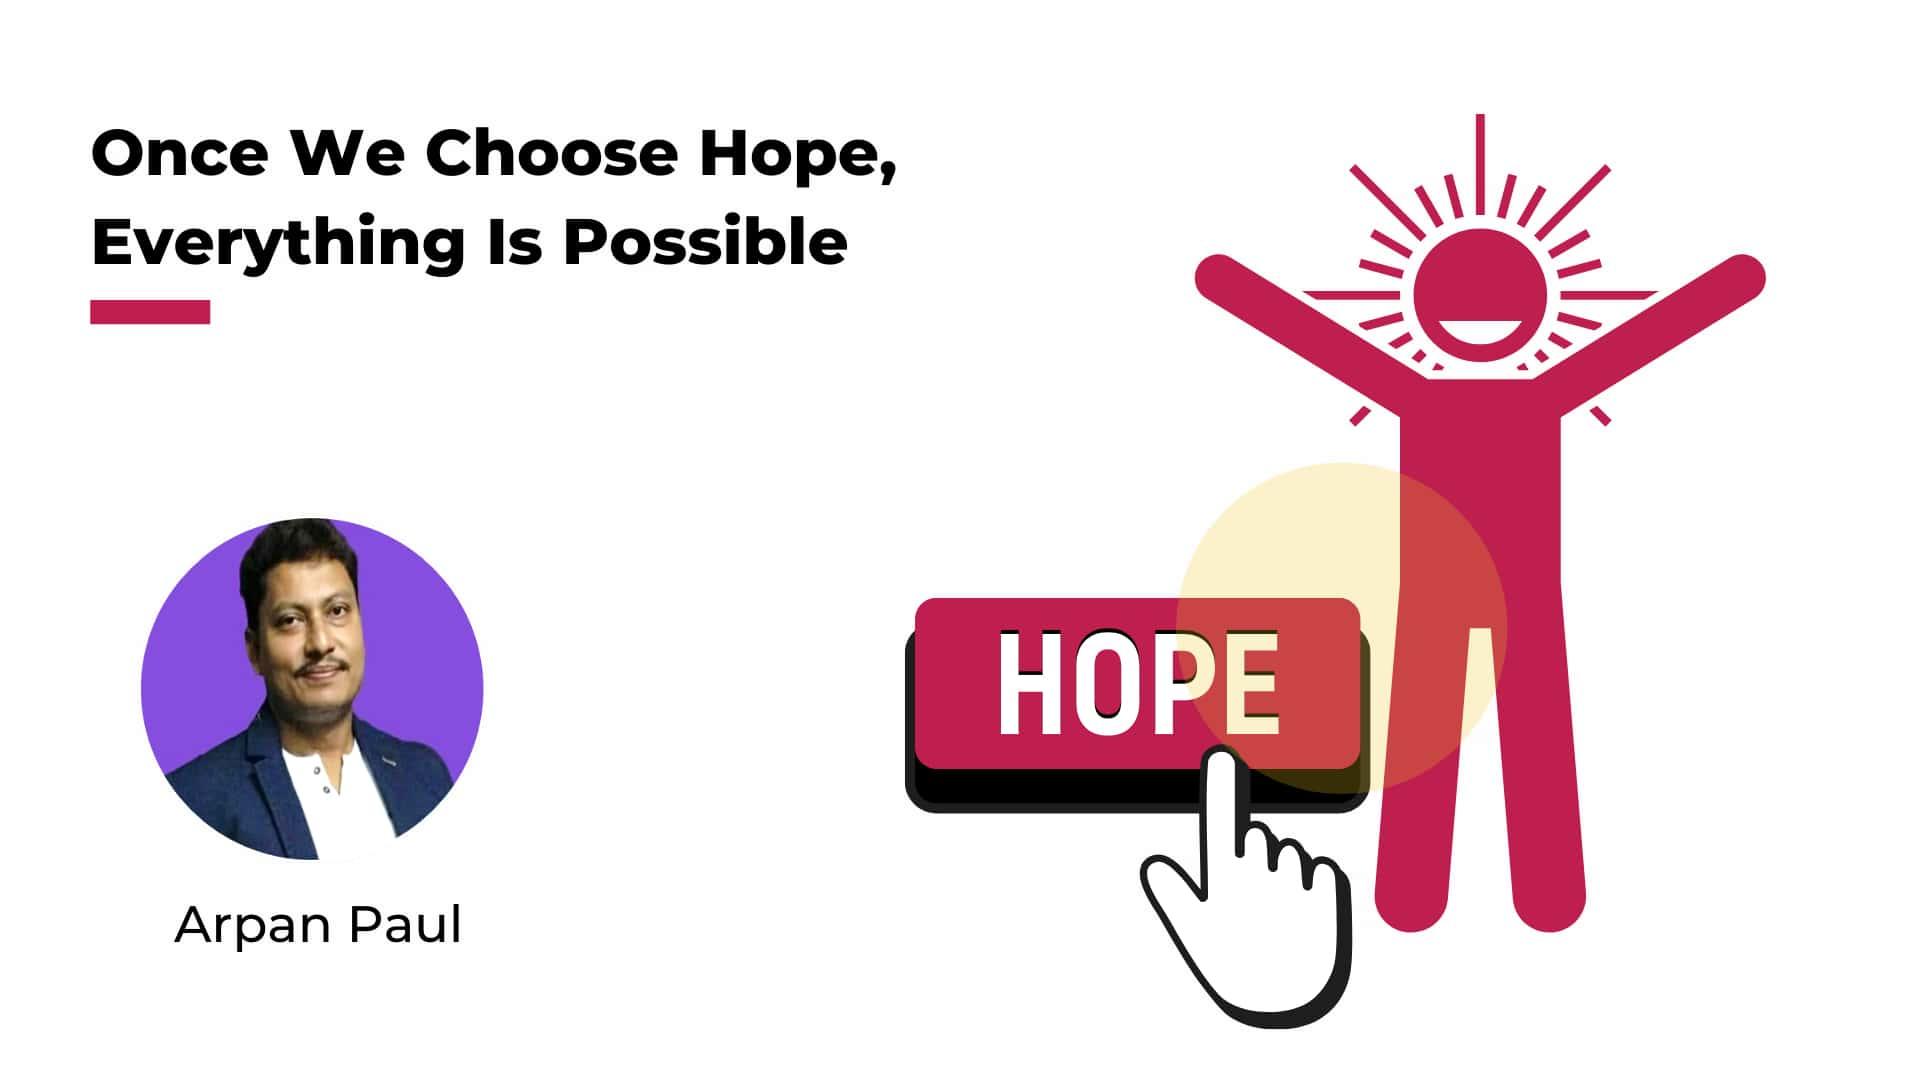 Hope and Self-belief